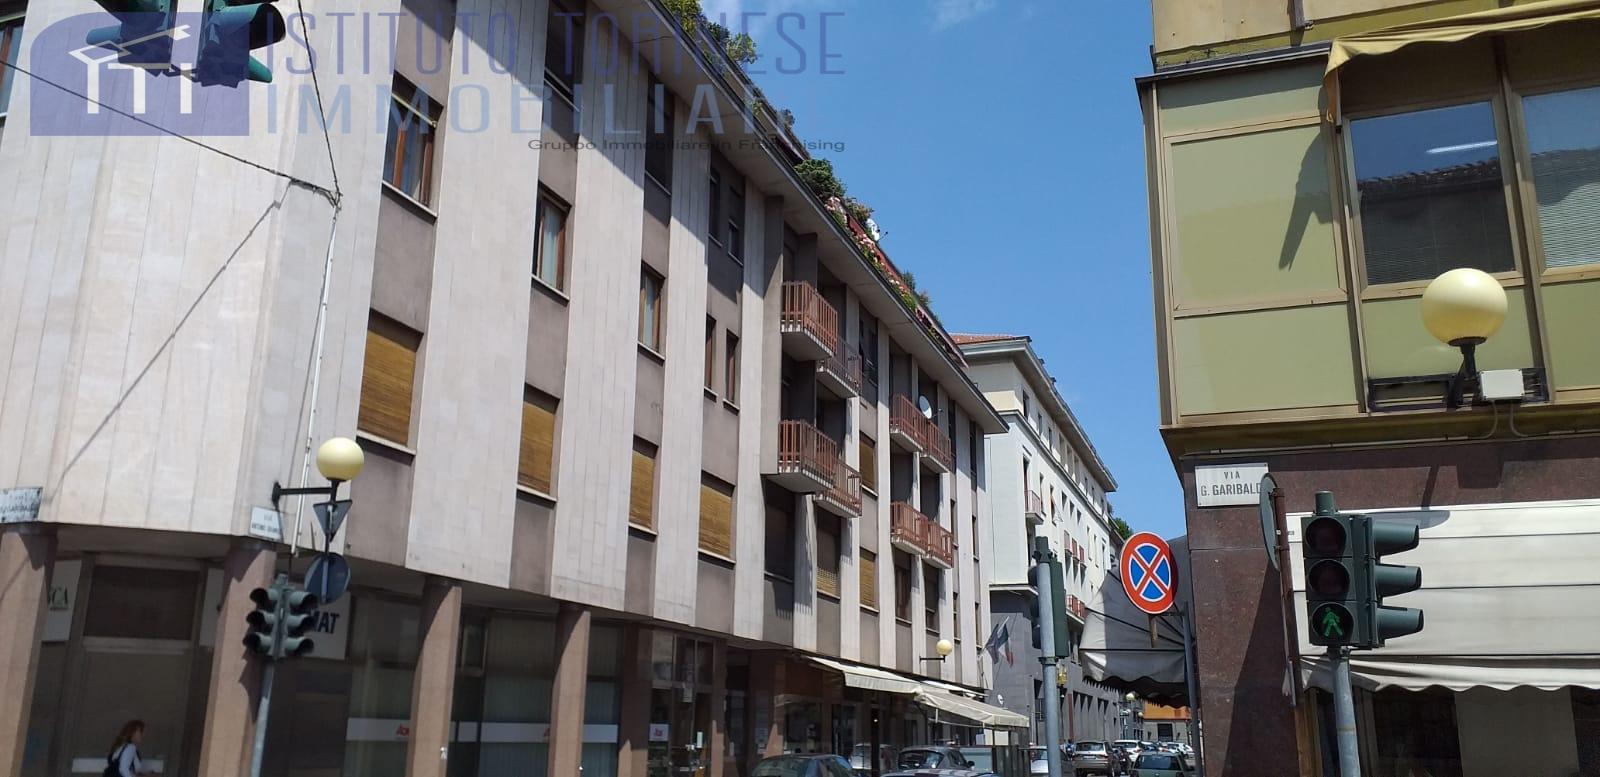 biella vendita quart:  istituto-torinese-immobiliare